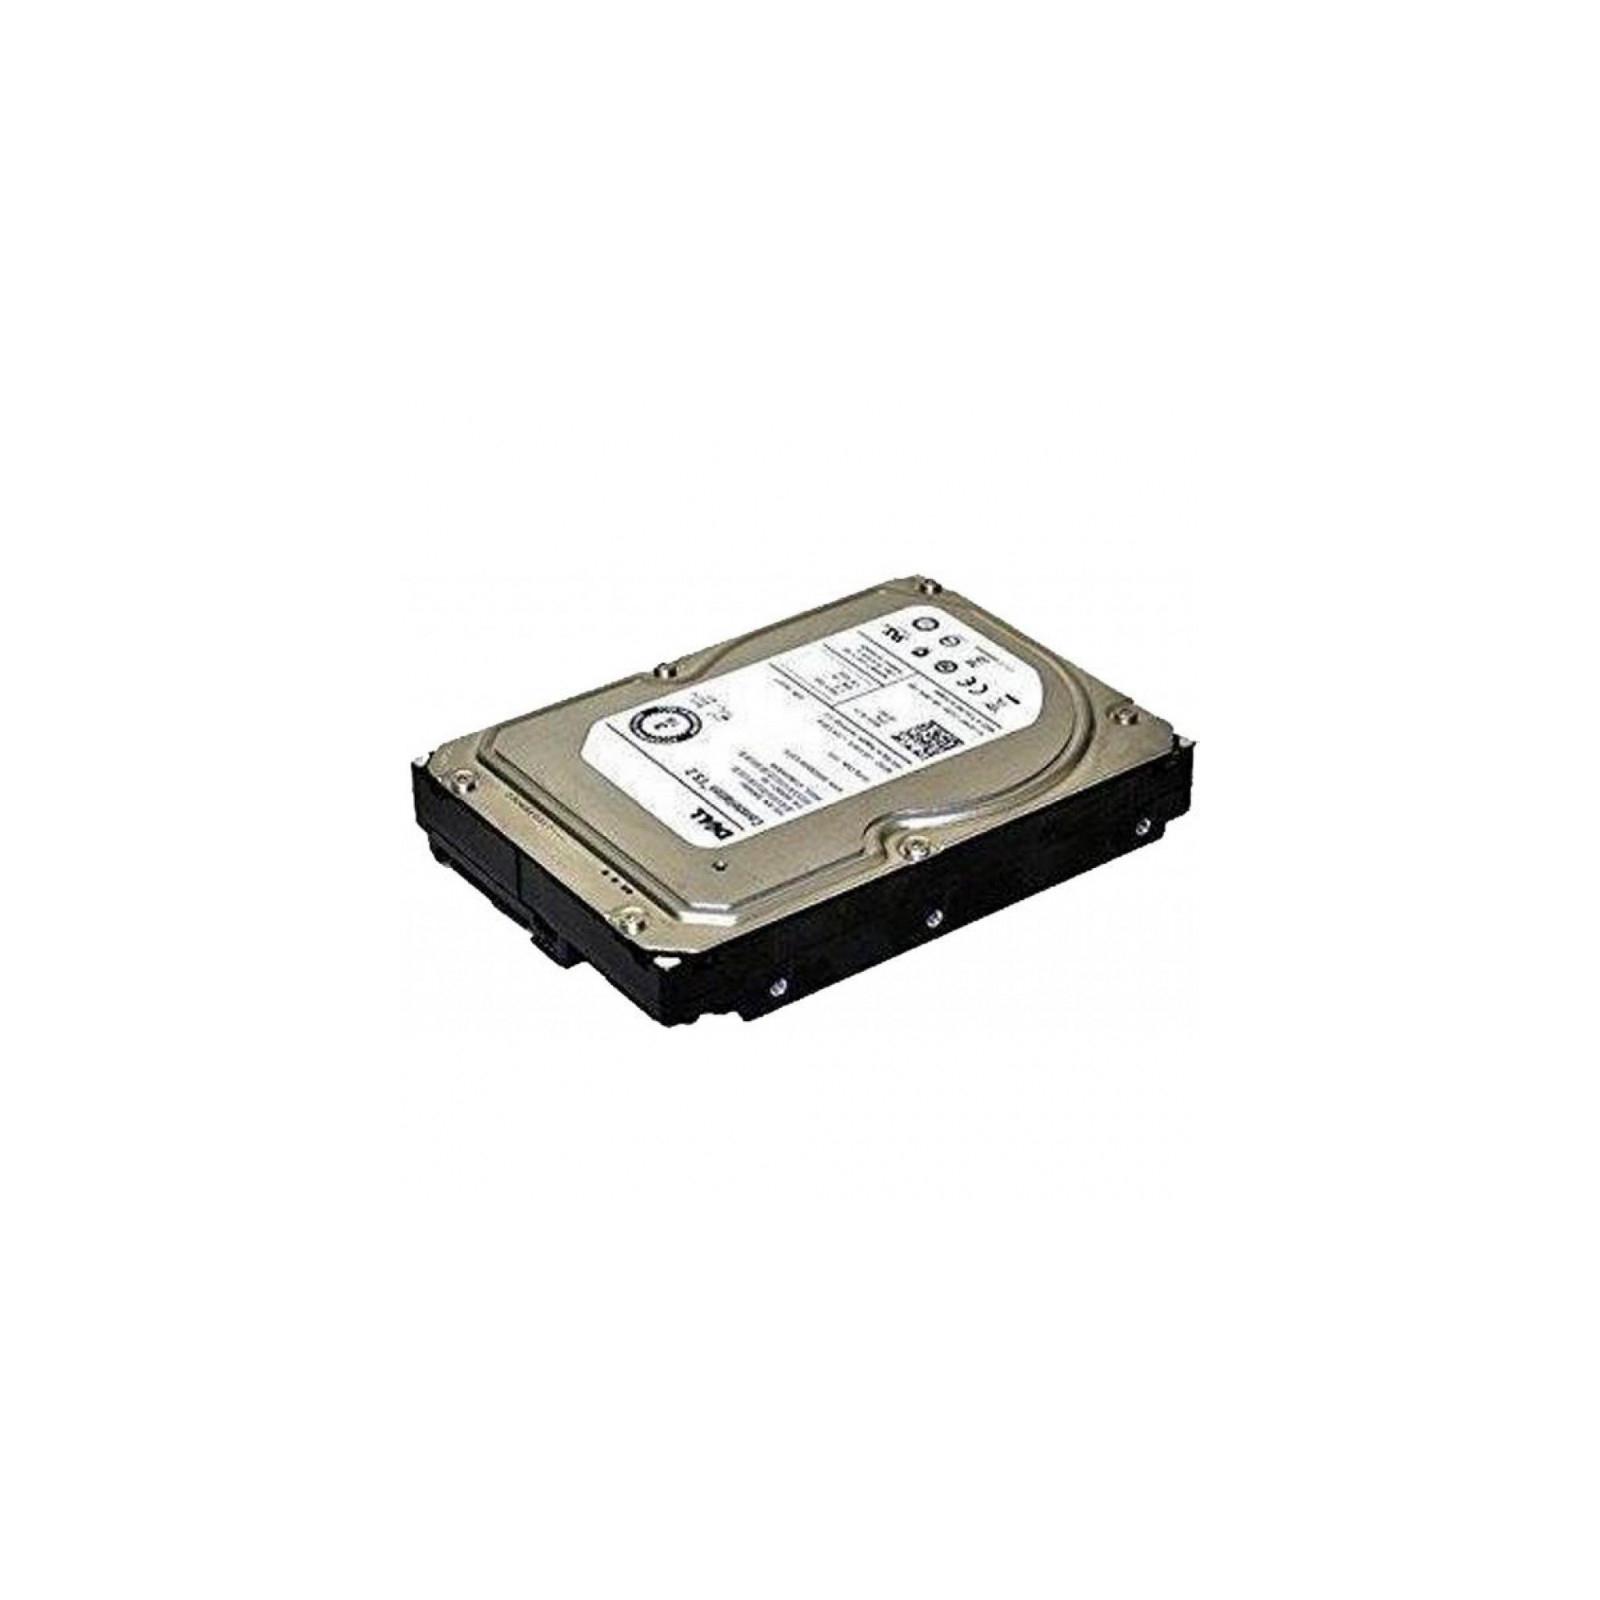 Жесткий диск для сервера Dell 1TB 7.2K RPM SATA 6Gbps 3.5in (400-AFXX-08)